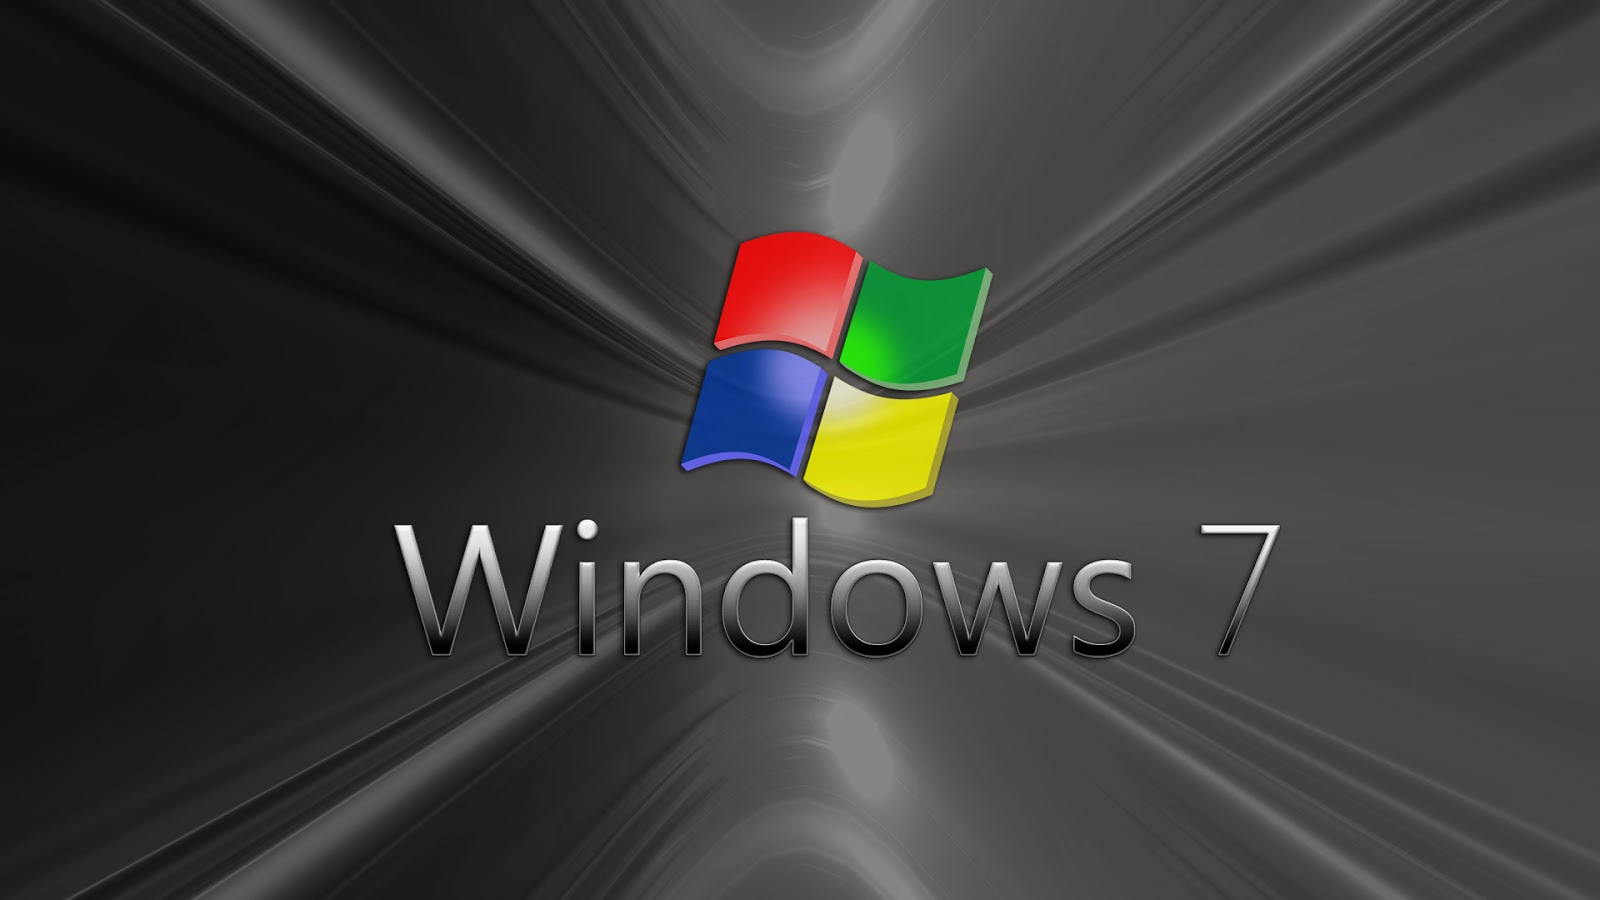 imagenes zt descarga fondos hd fondo de pantalla windows 7